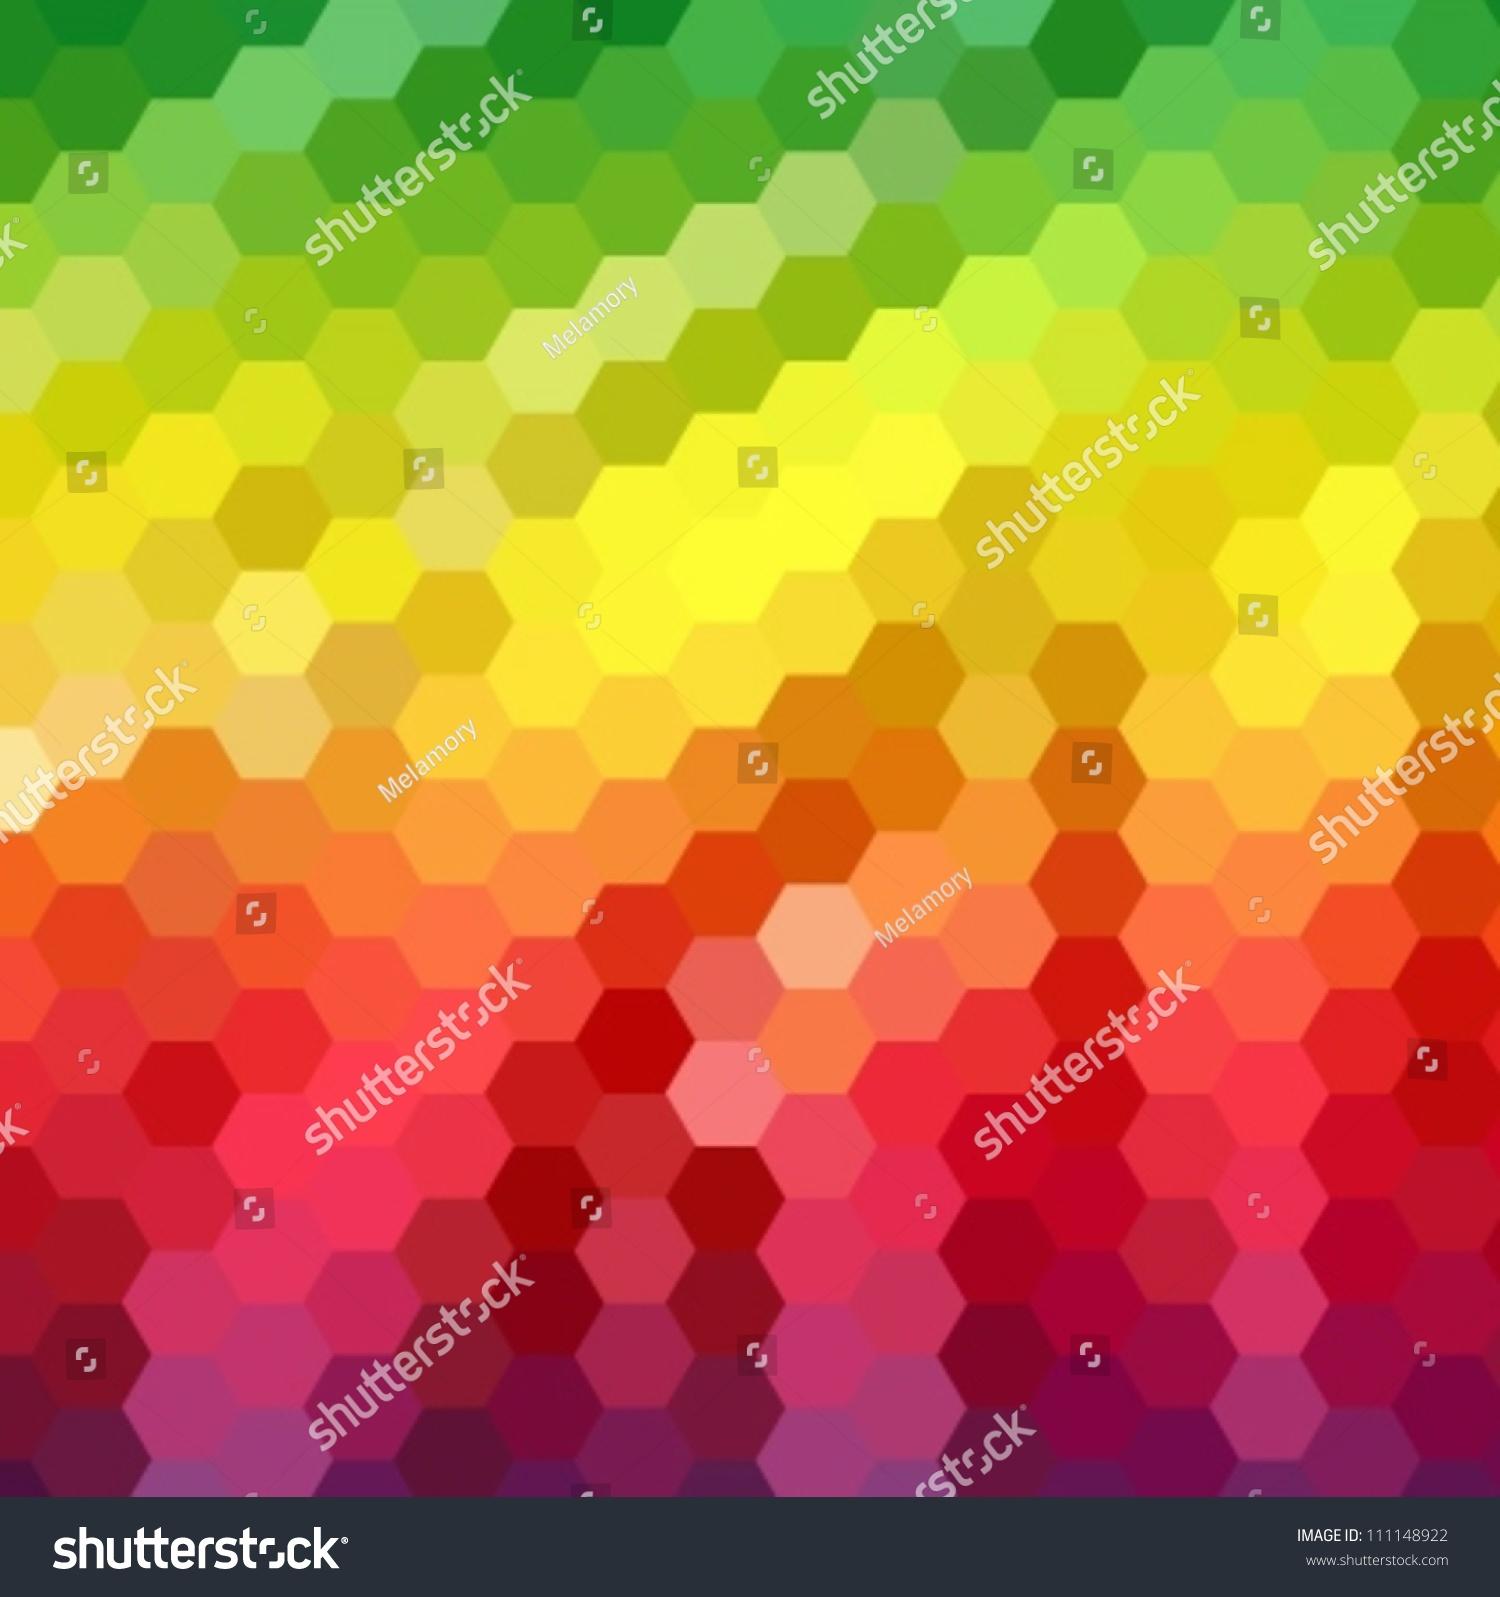 Abstract Background Design Stock Vector 111148922 - Shutterstock